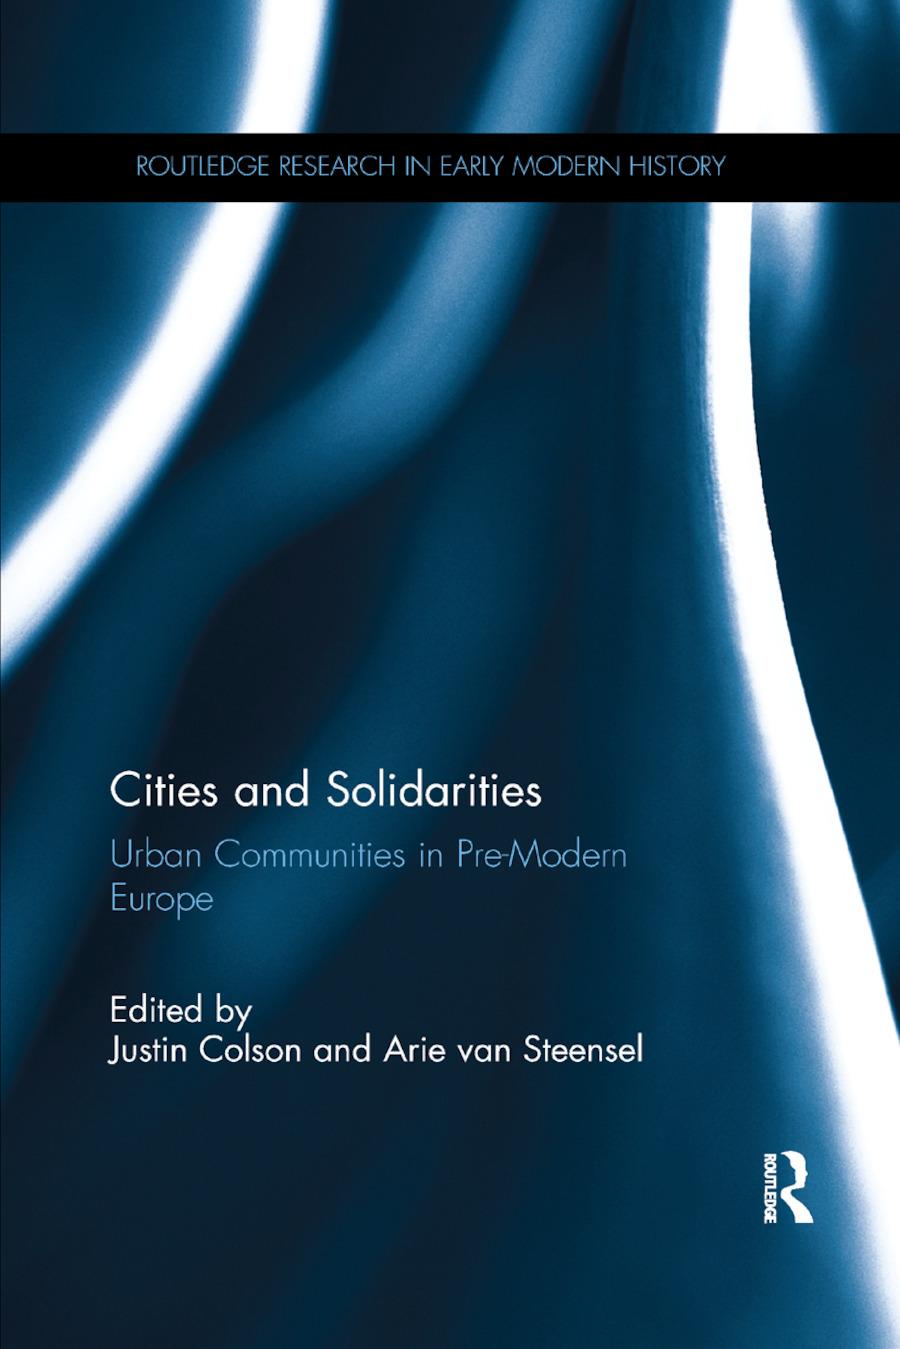 Cities and Solidarities: Urban Communities in Pre-Modern Europe book cover